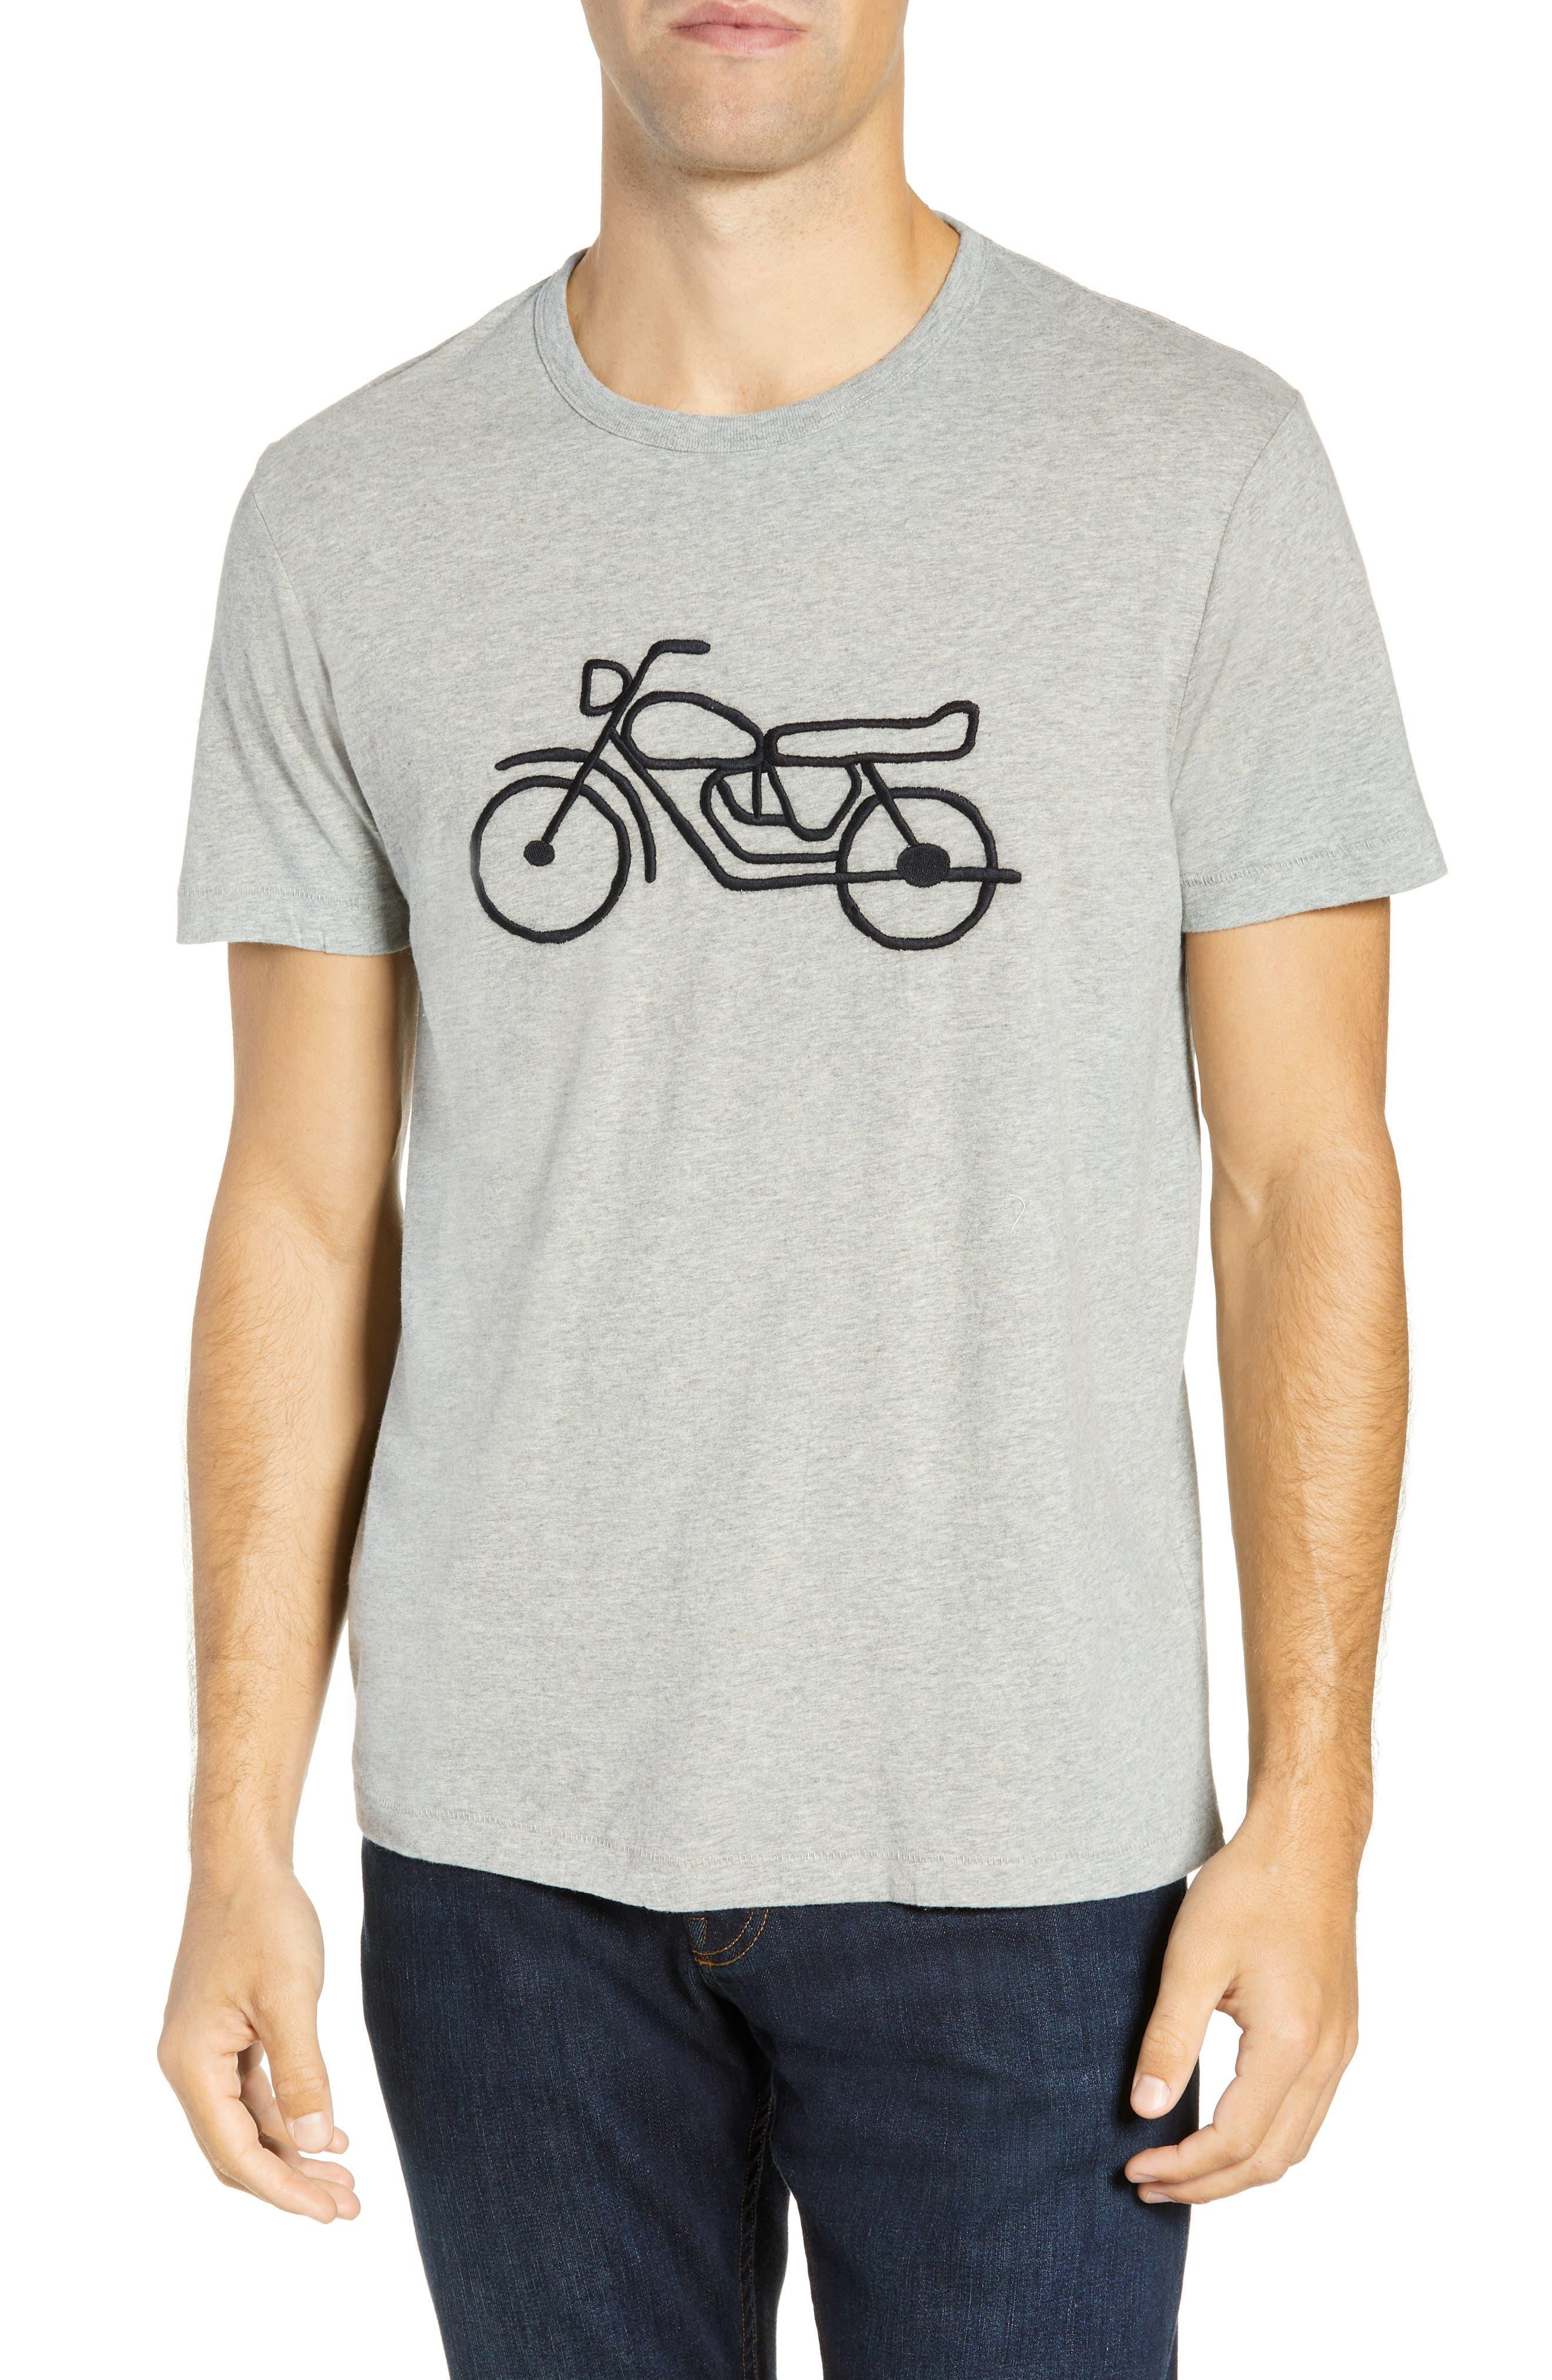 Motorcycle Regular Fit Cotton T-Shirt,                             Main thumbnail 1, color,                             GREY MELANGE BLACK